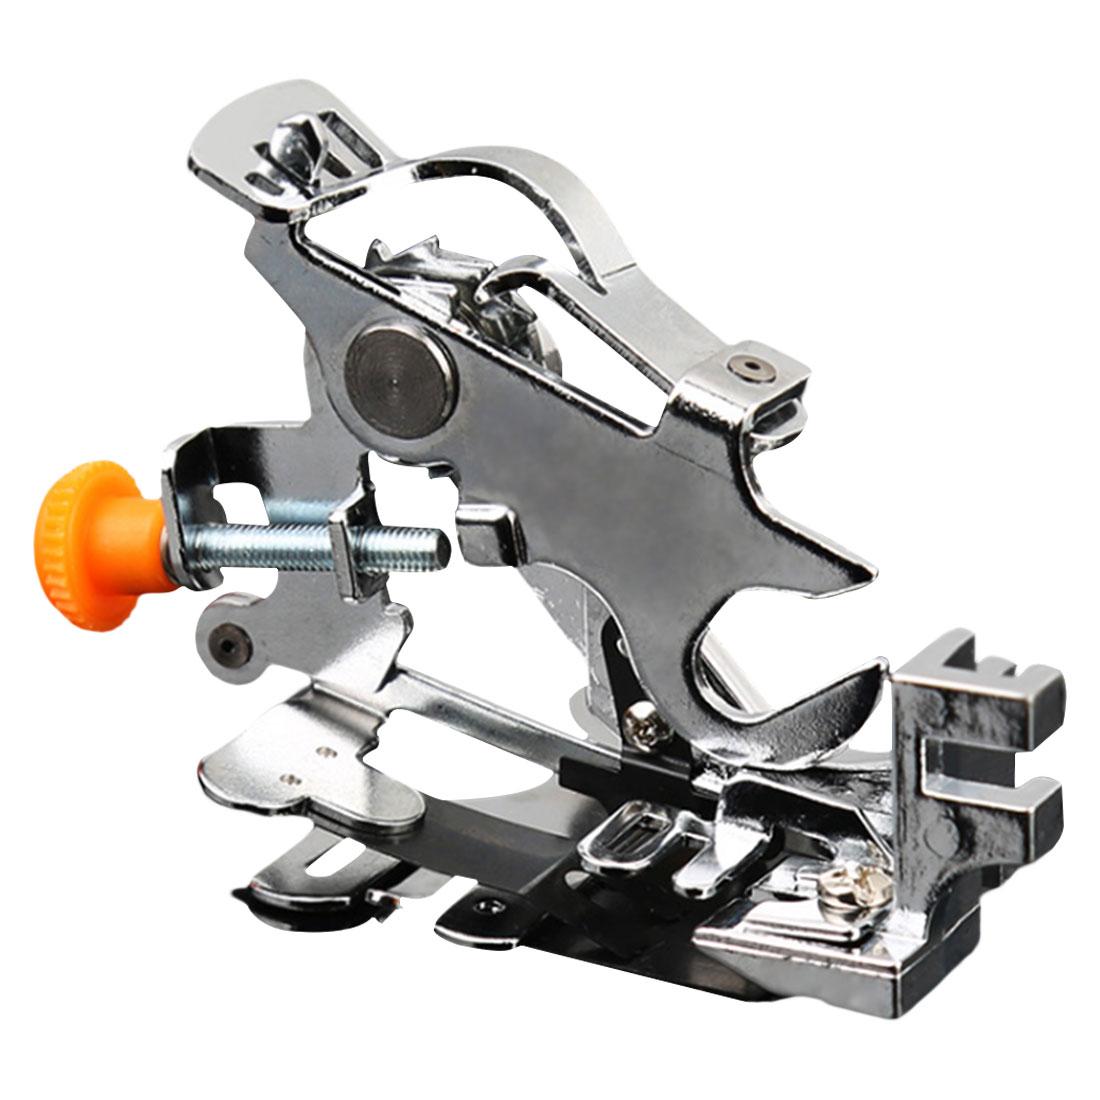 Household Sewing Machine Ruffler Presser Foot Low Shank Pleated Attachment Presser Foot Sewing Machine Accessories